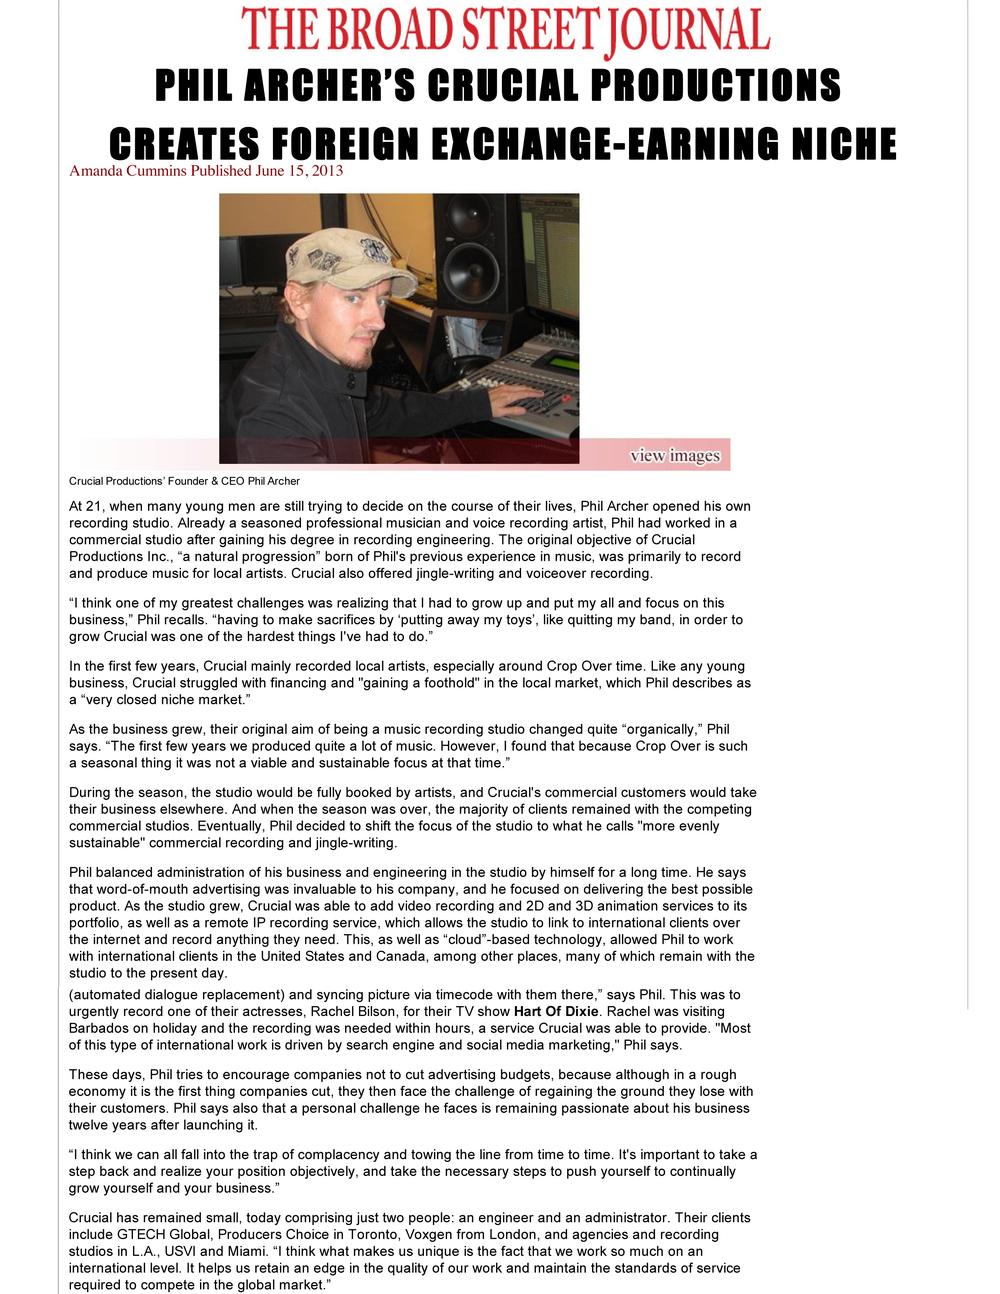 BSJ 2013 - Phil Archer's Crucial Productions.jpg